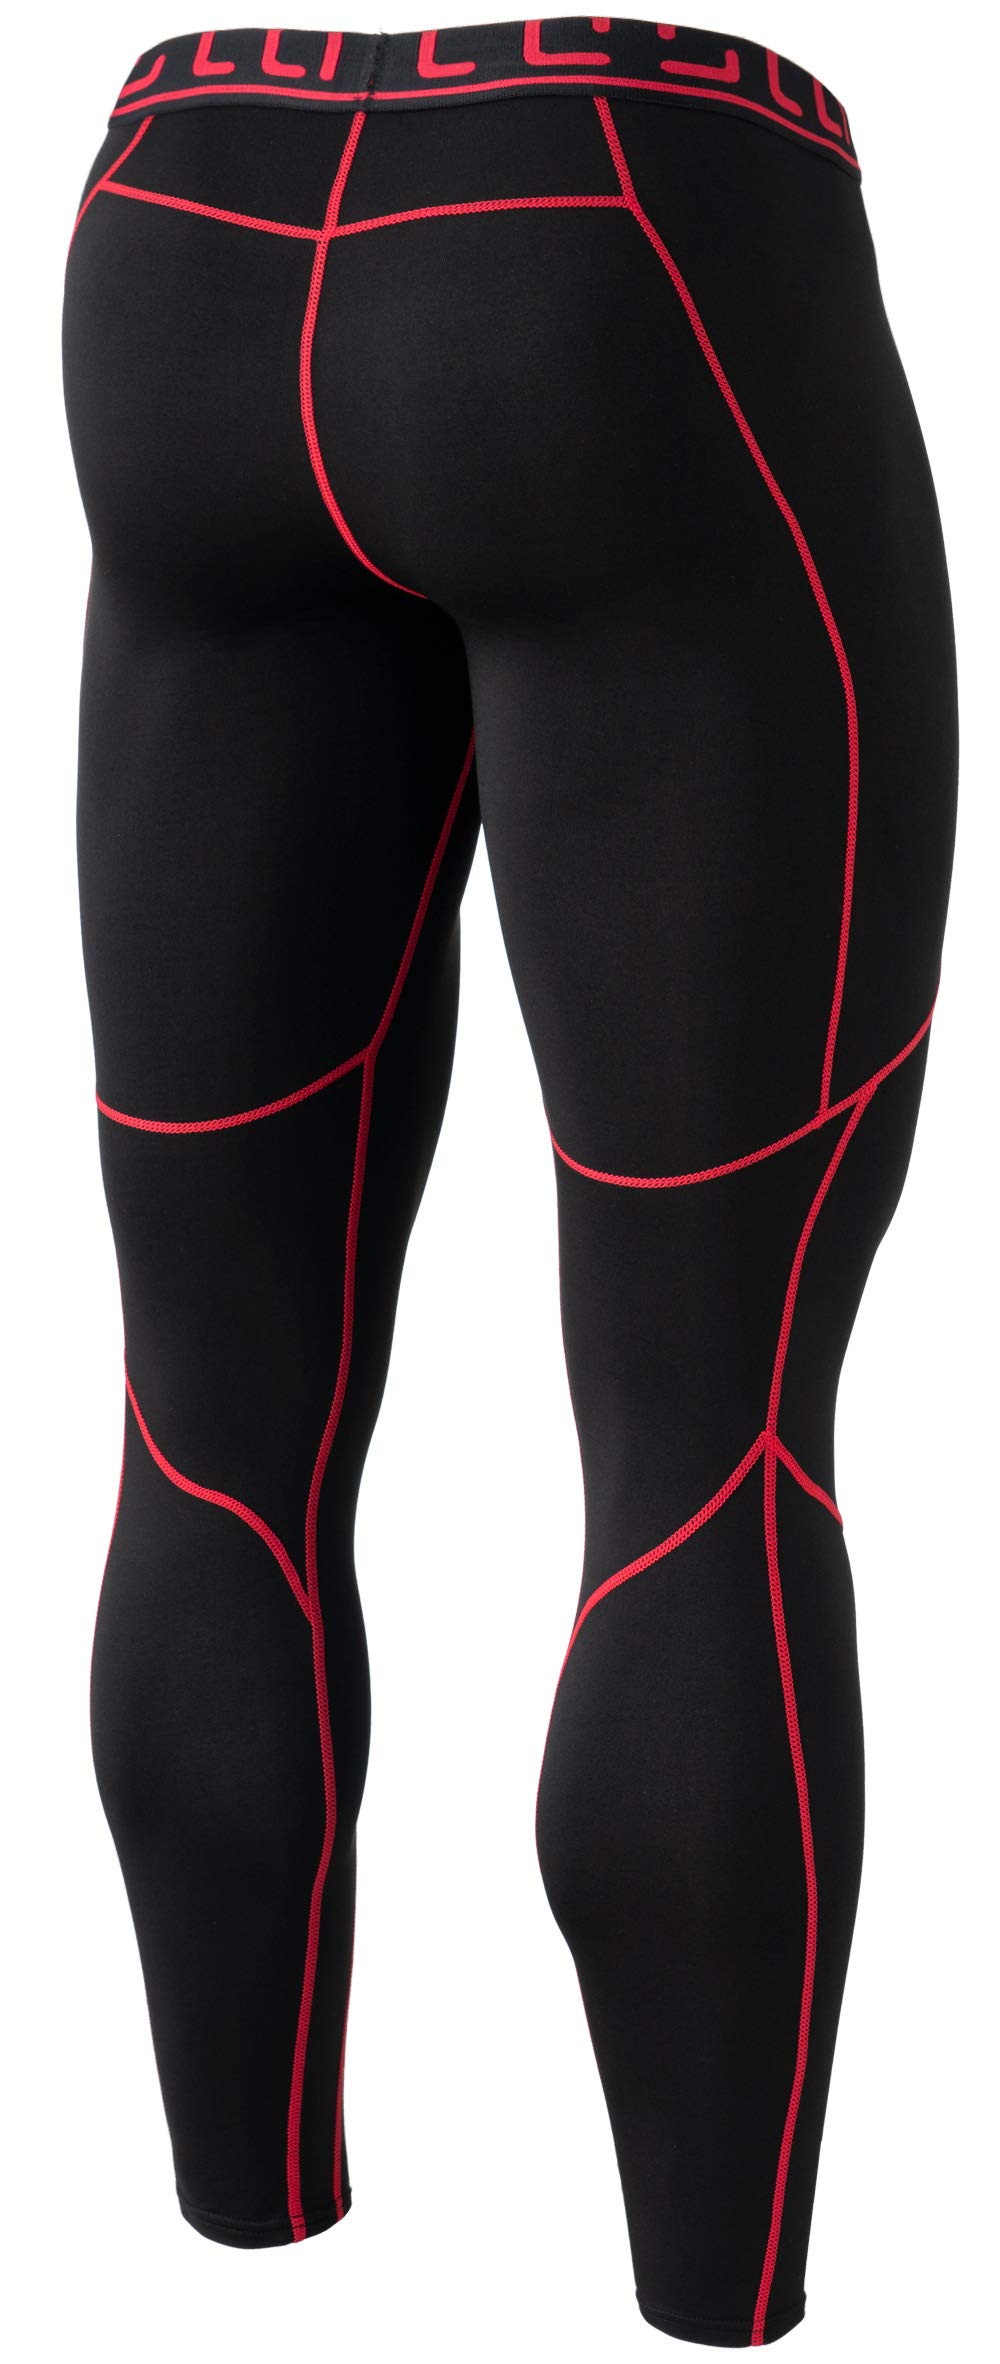 TSLA TM-YUP43-KKR_3X-Large Men's Emboss Pants Thermal Wintergear Compression Baselayer Sports Leggings YUP43 by TSLA (Image #2)